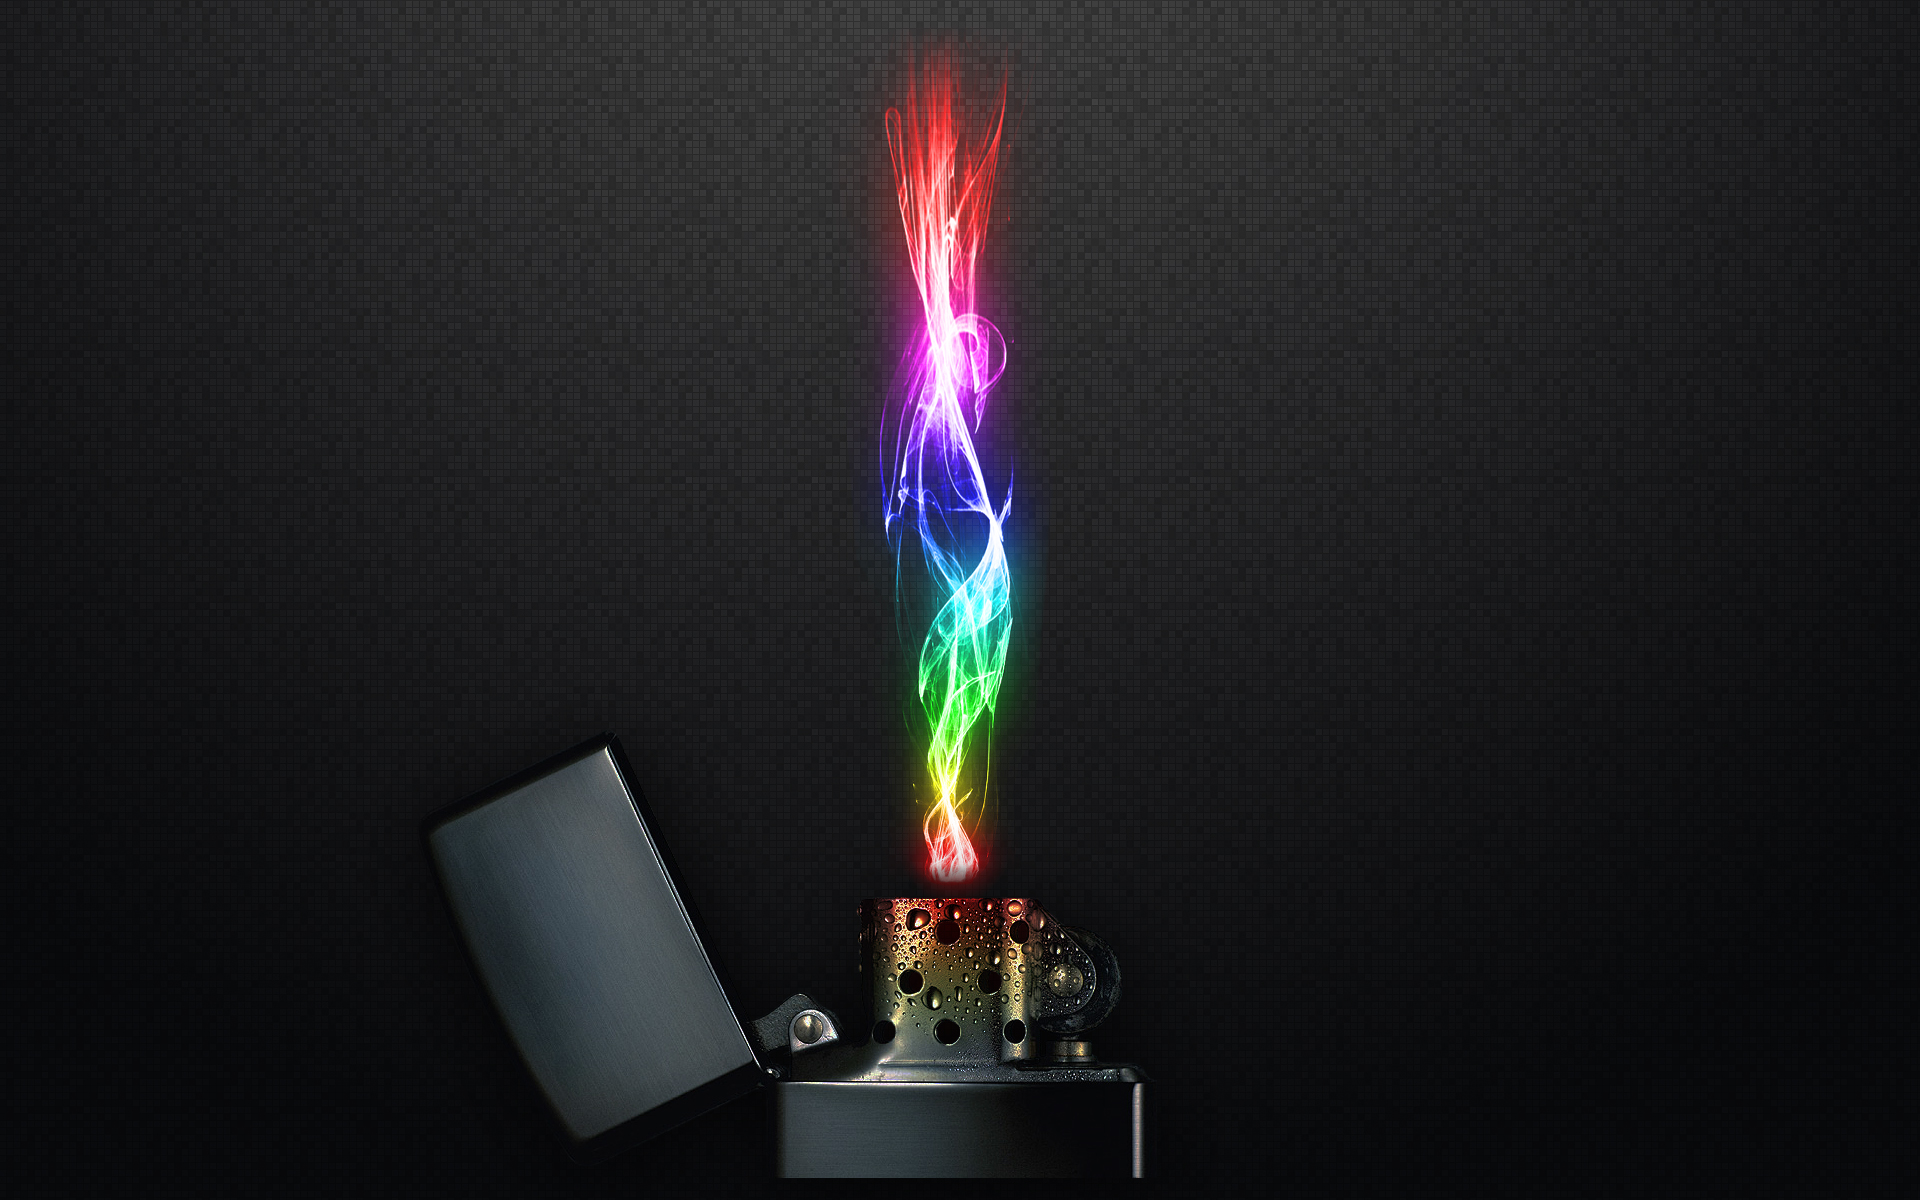 Acid Lighter